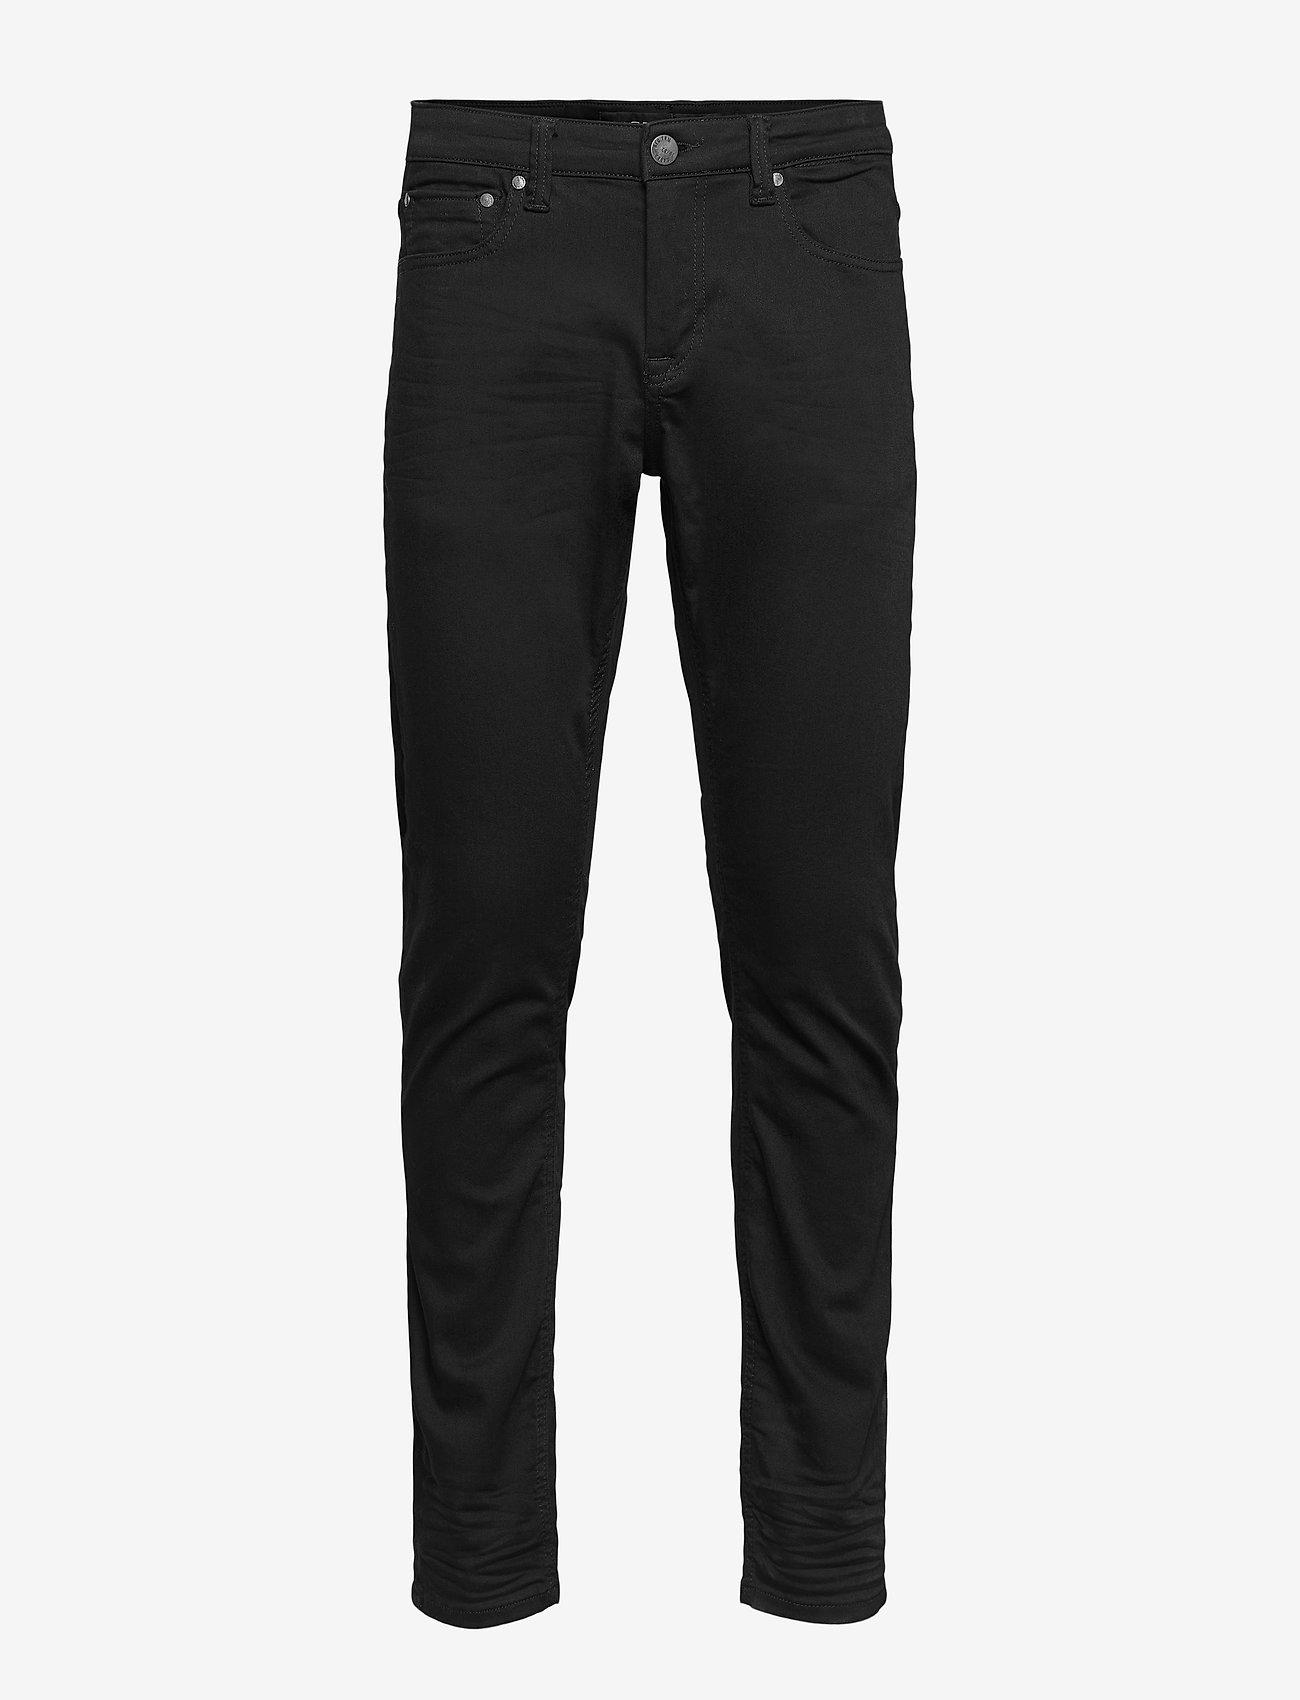 Gabba - Jones K1911 Black Jeans - slim jeans - rs0955 - 0